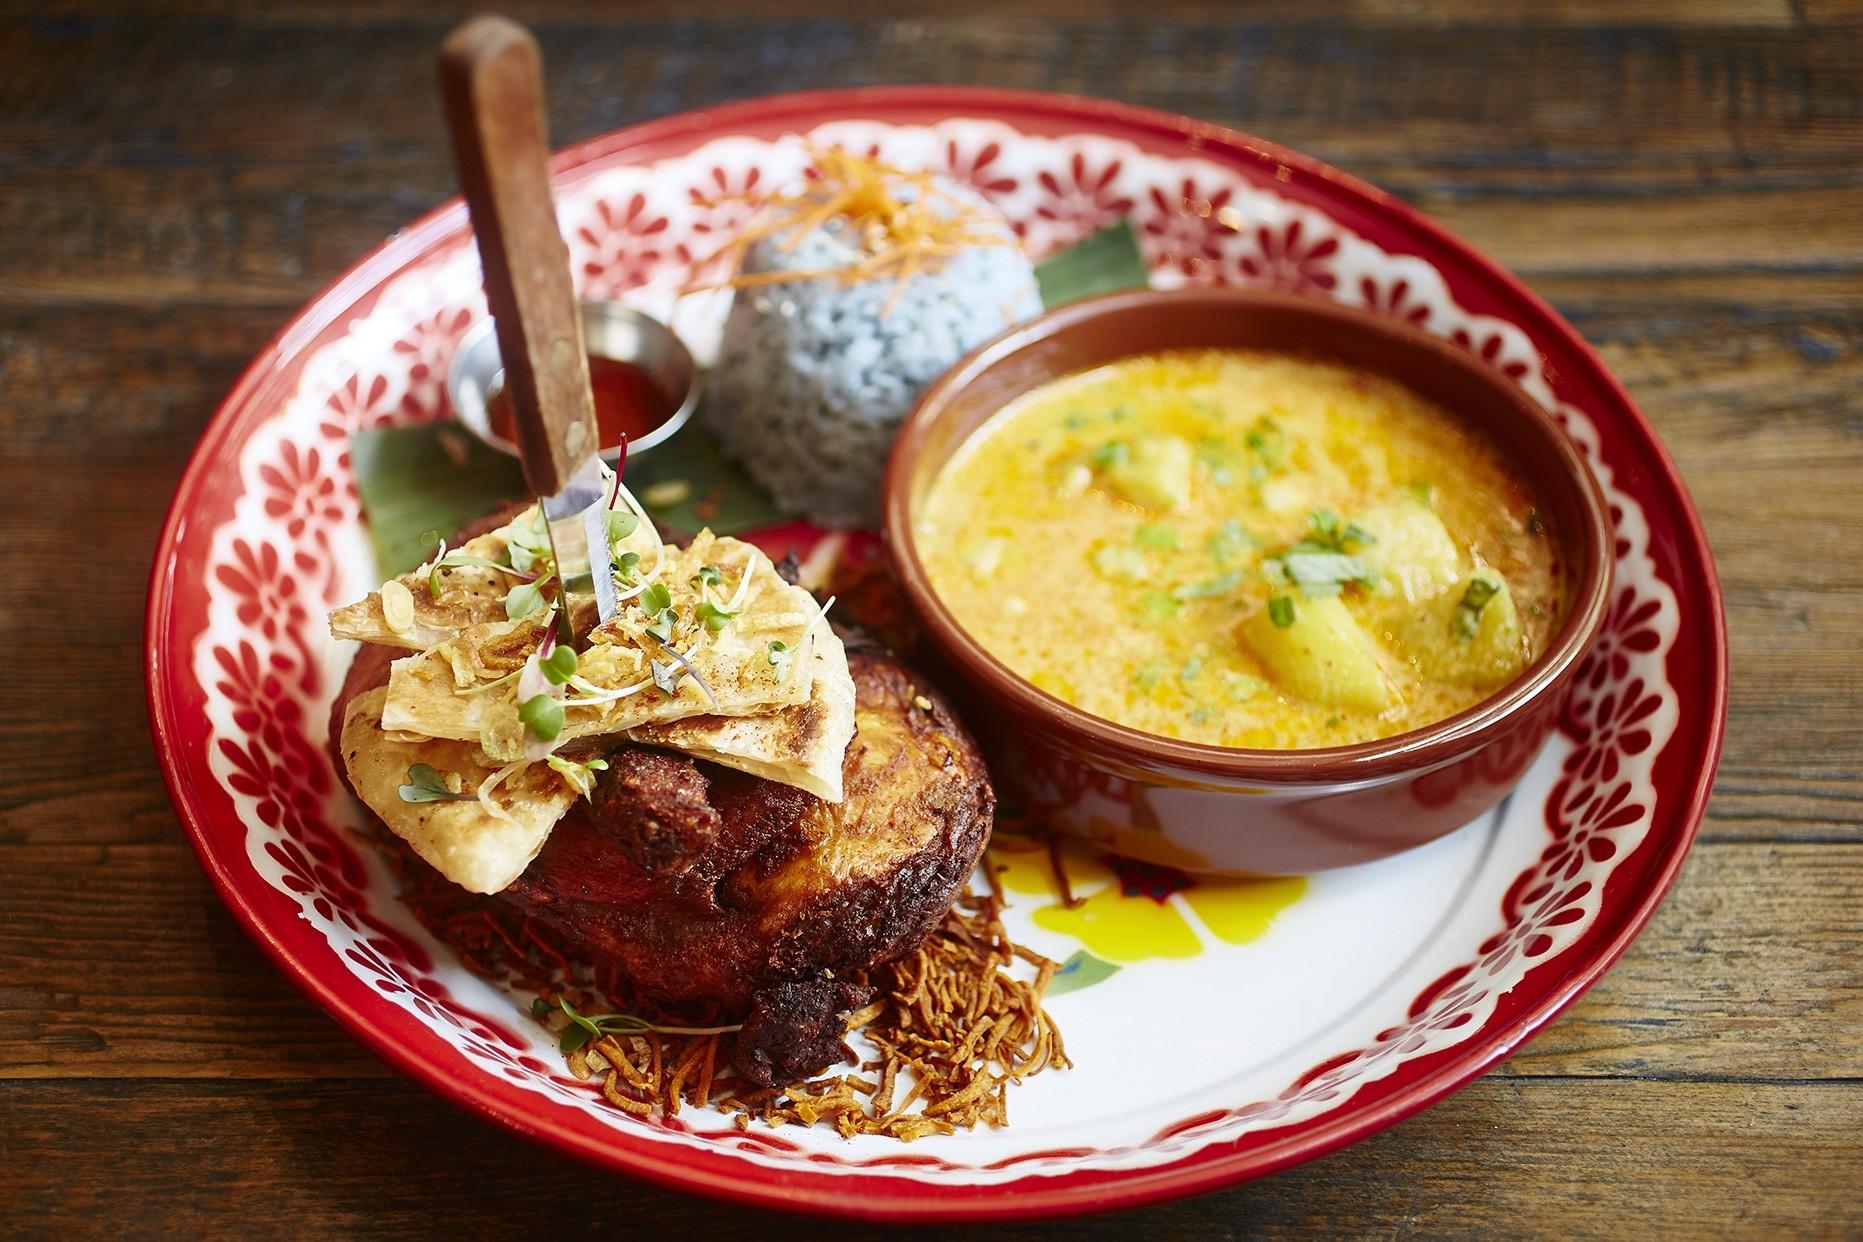 Farmhouse Kitchen Thai Cuisine Opens In Jack London Square